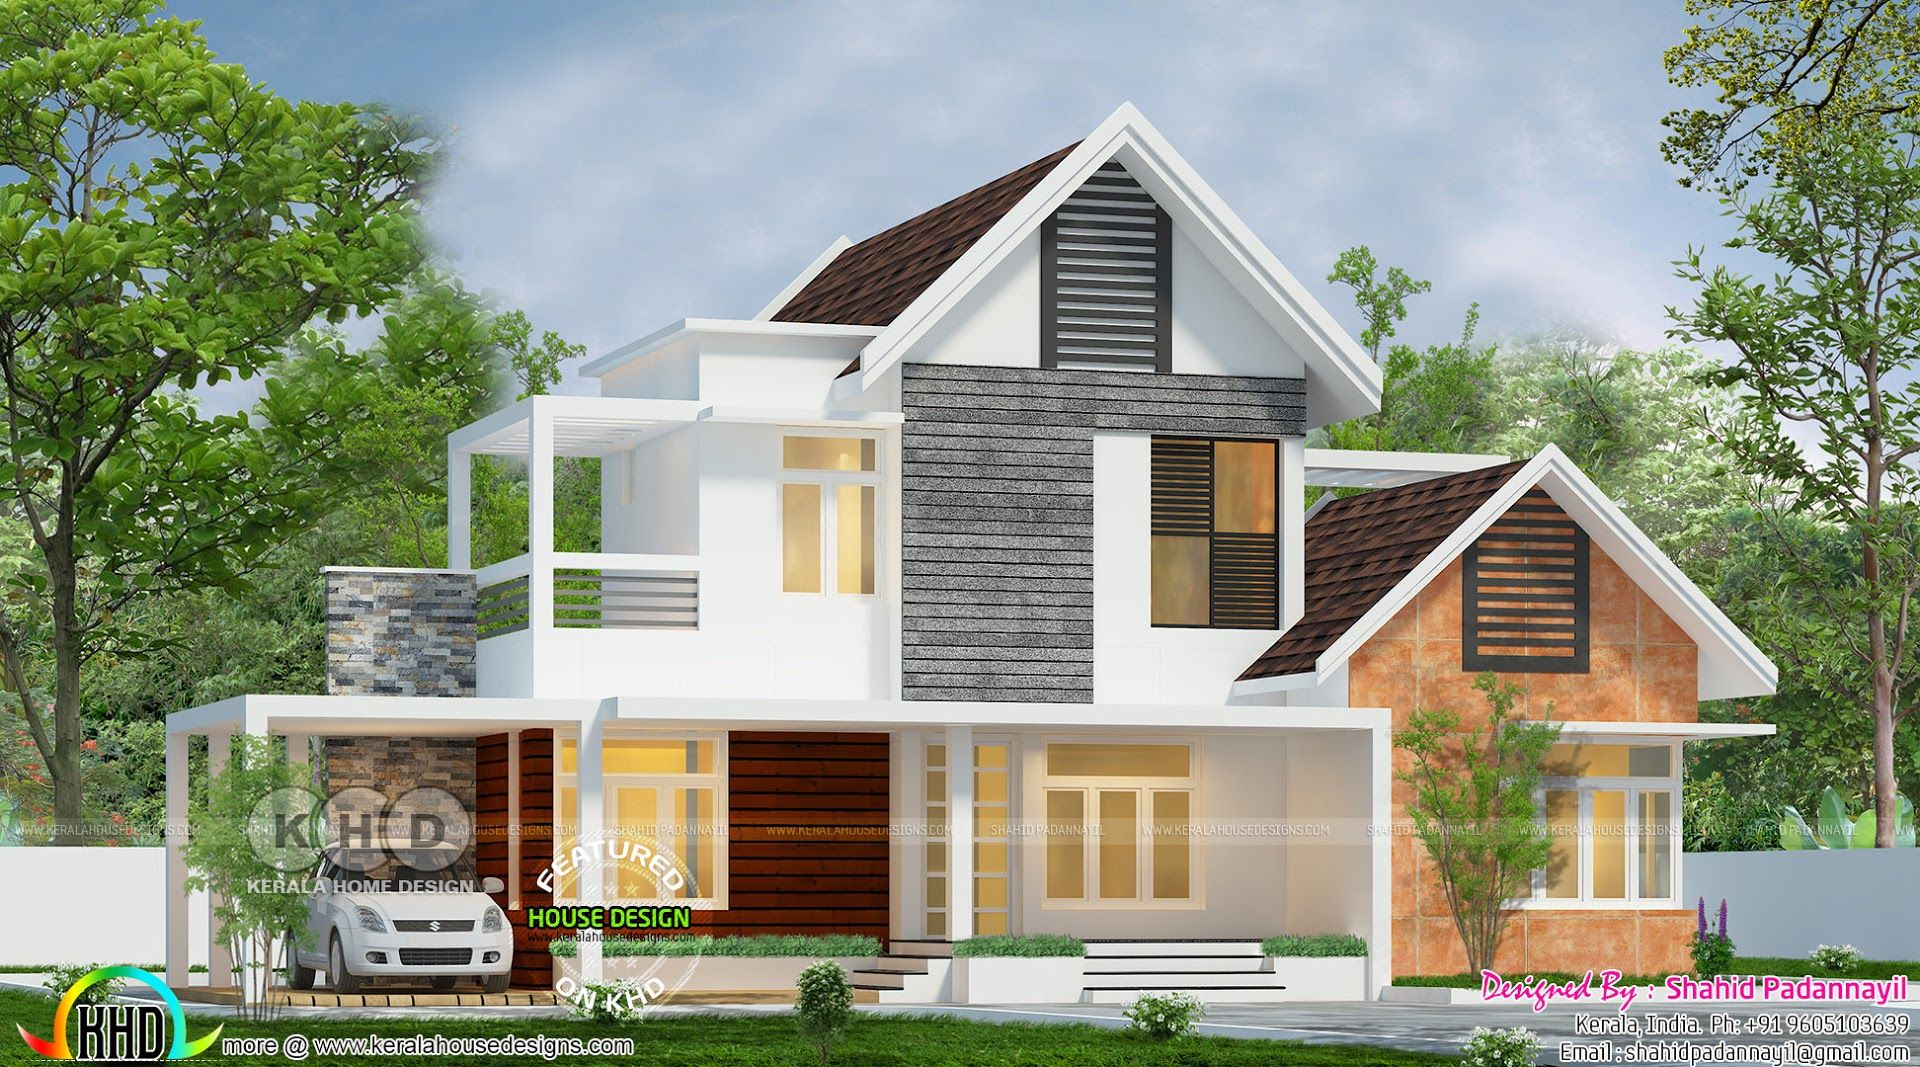 Beautiful Mixed Roof 3 Bedroom House Kerala House Design House